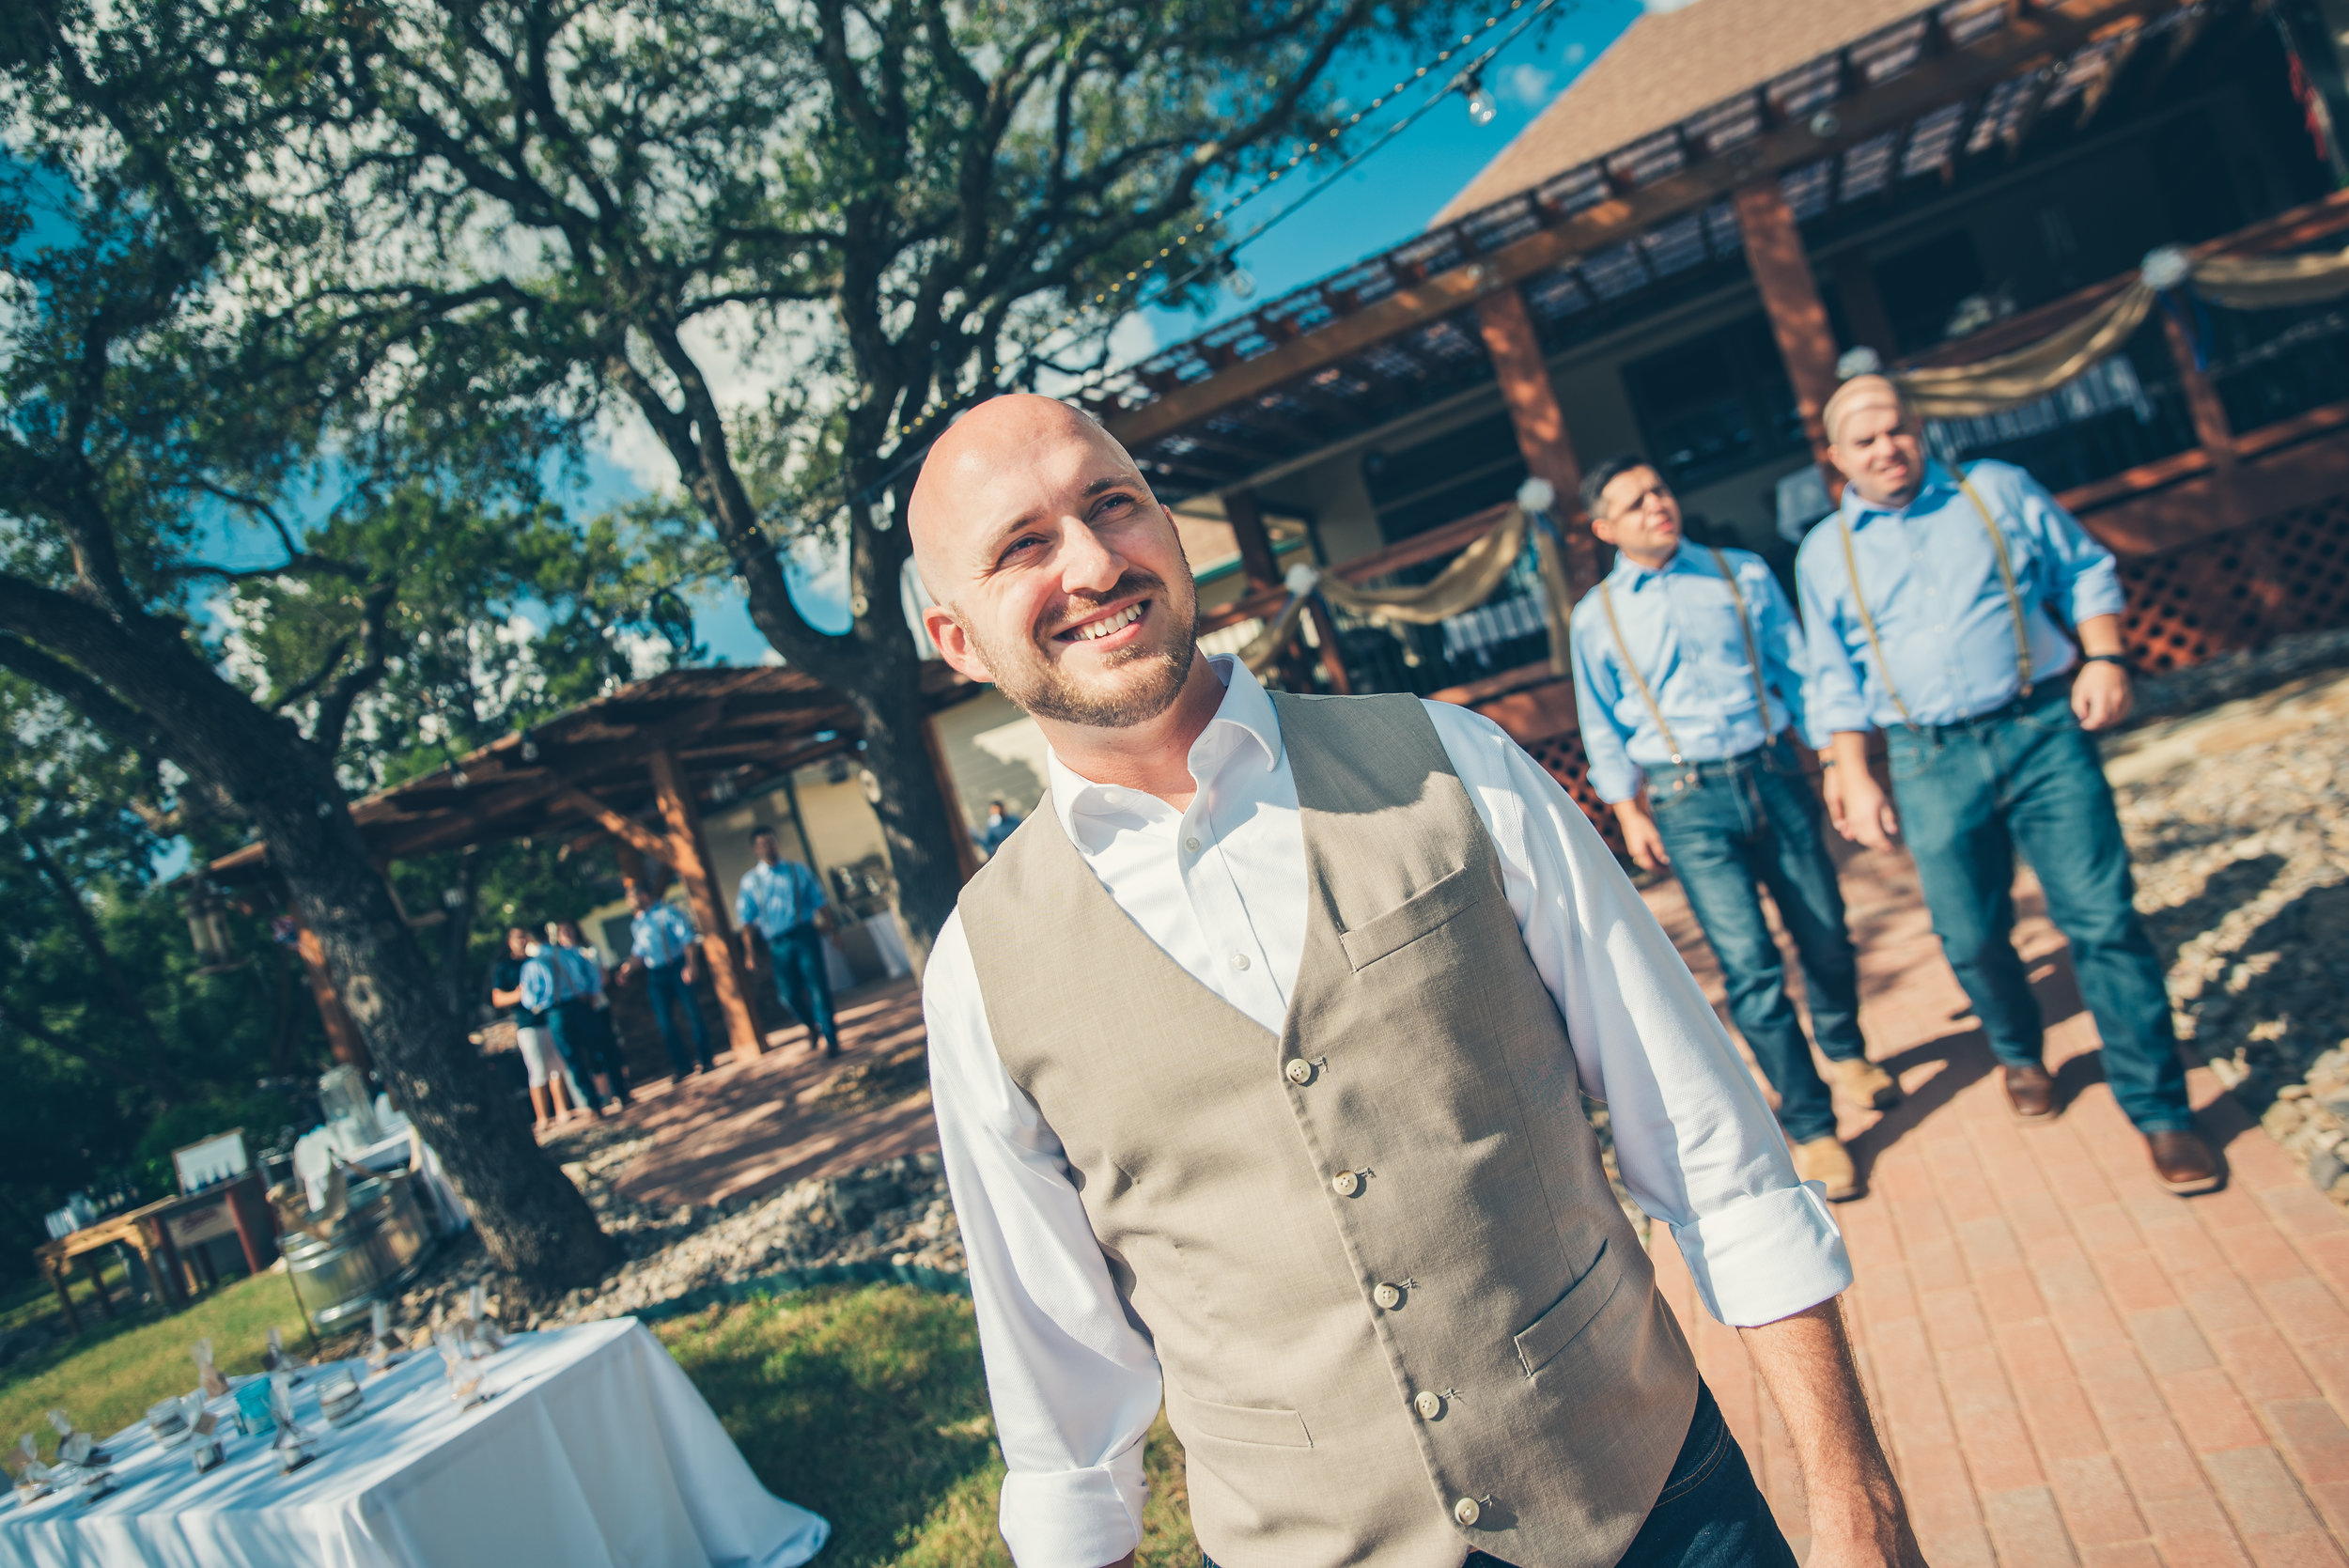 Jacob and Brene Wedding-39-4-4K.jpg